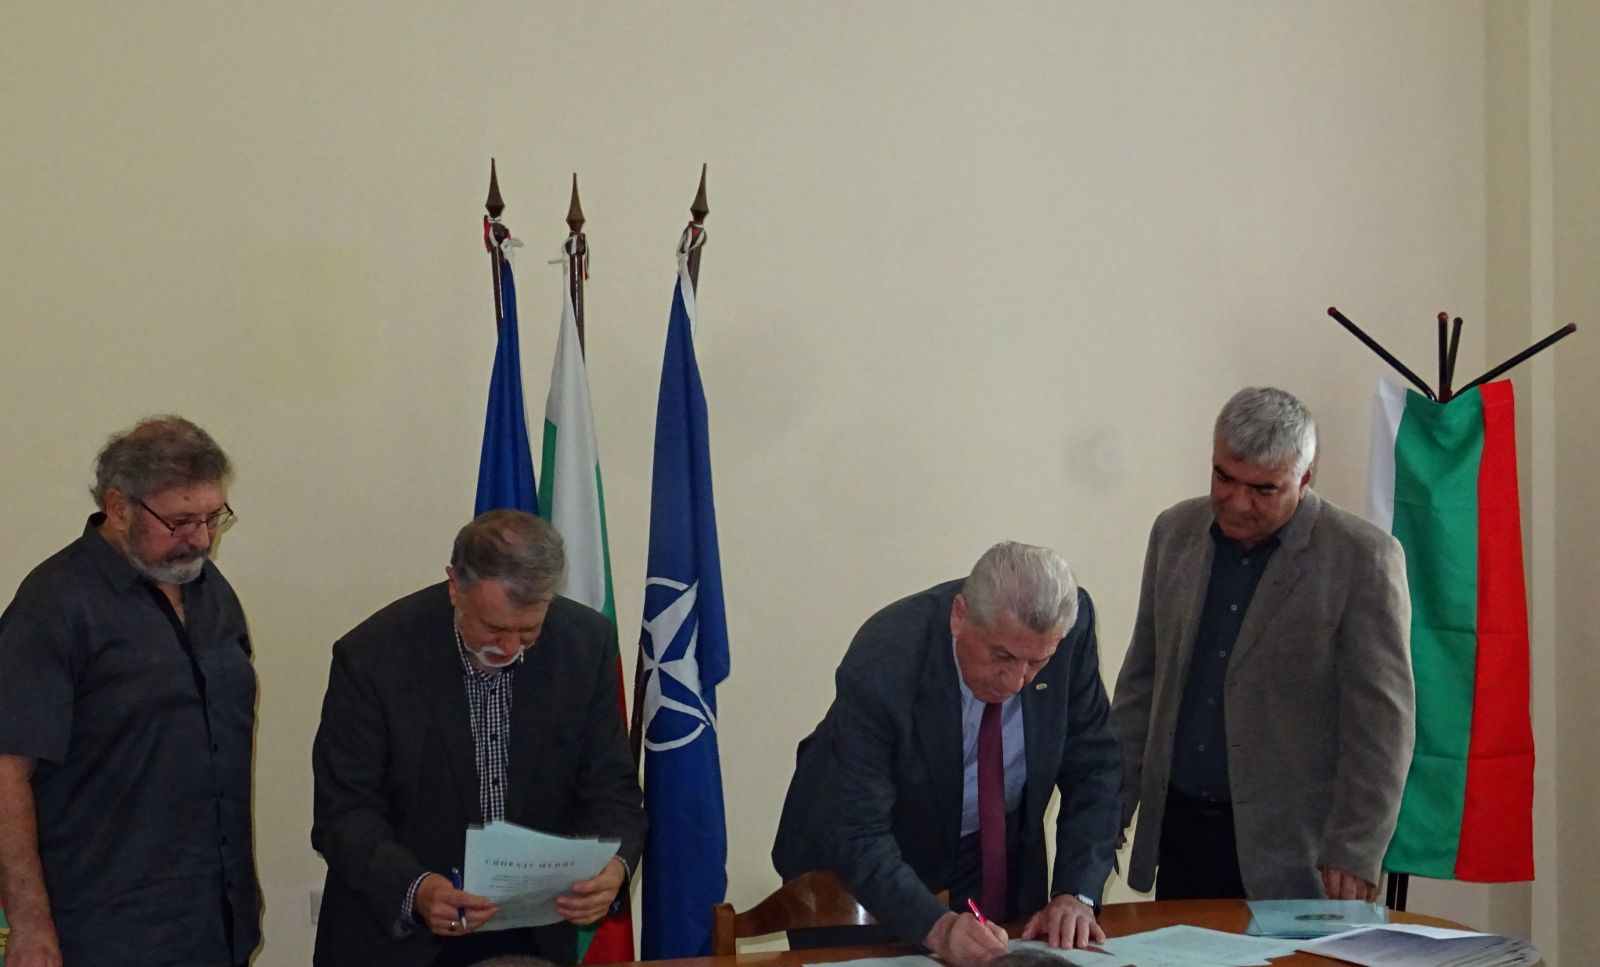 Нов клуб на военнопатриотичен съюз в Пловдив